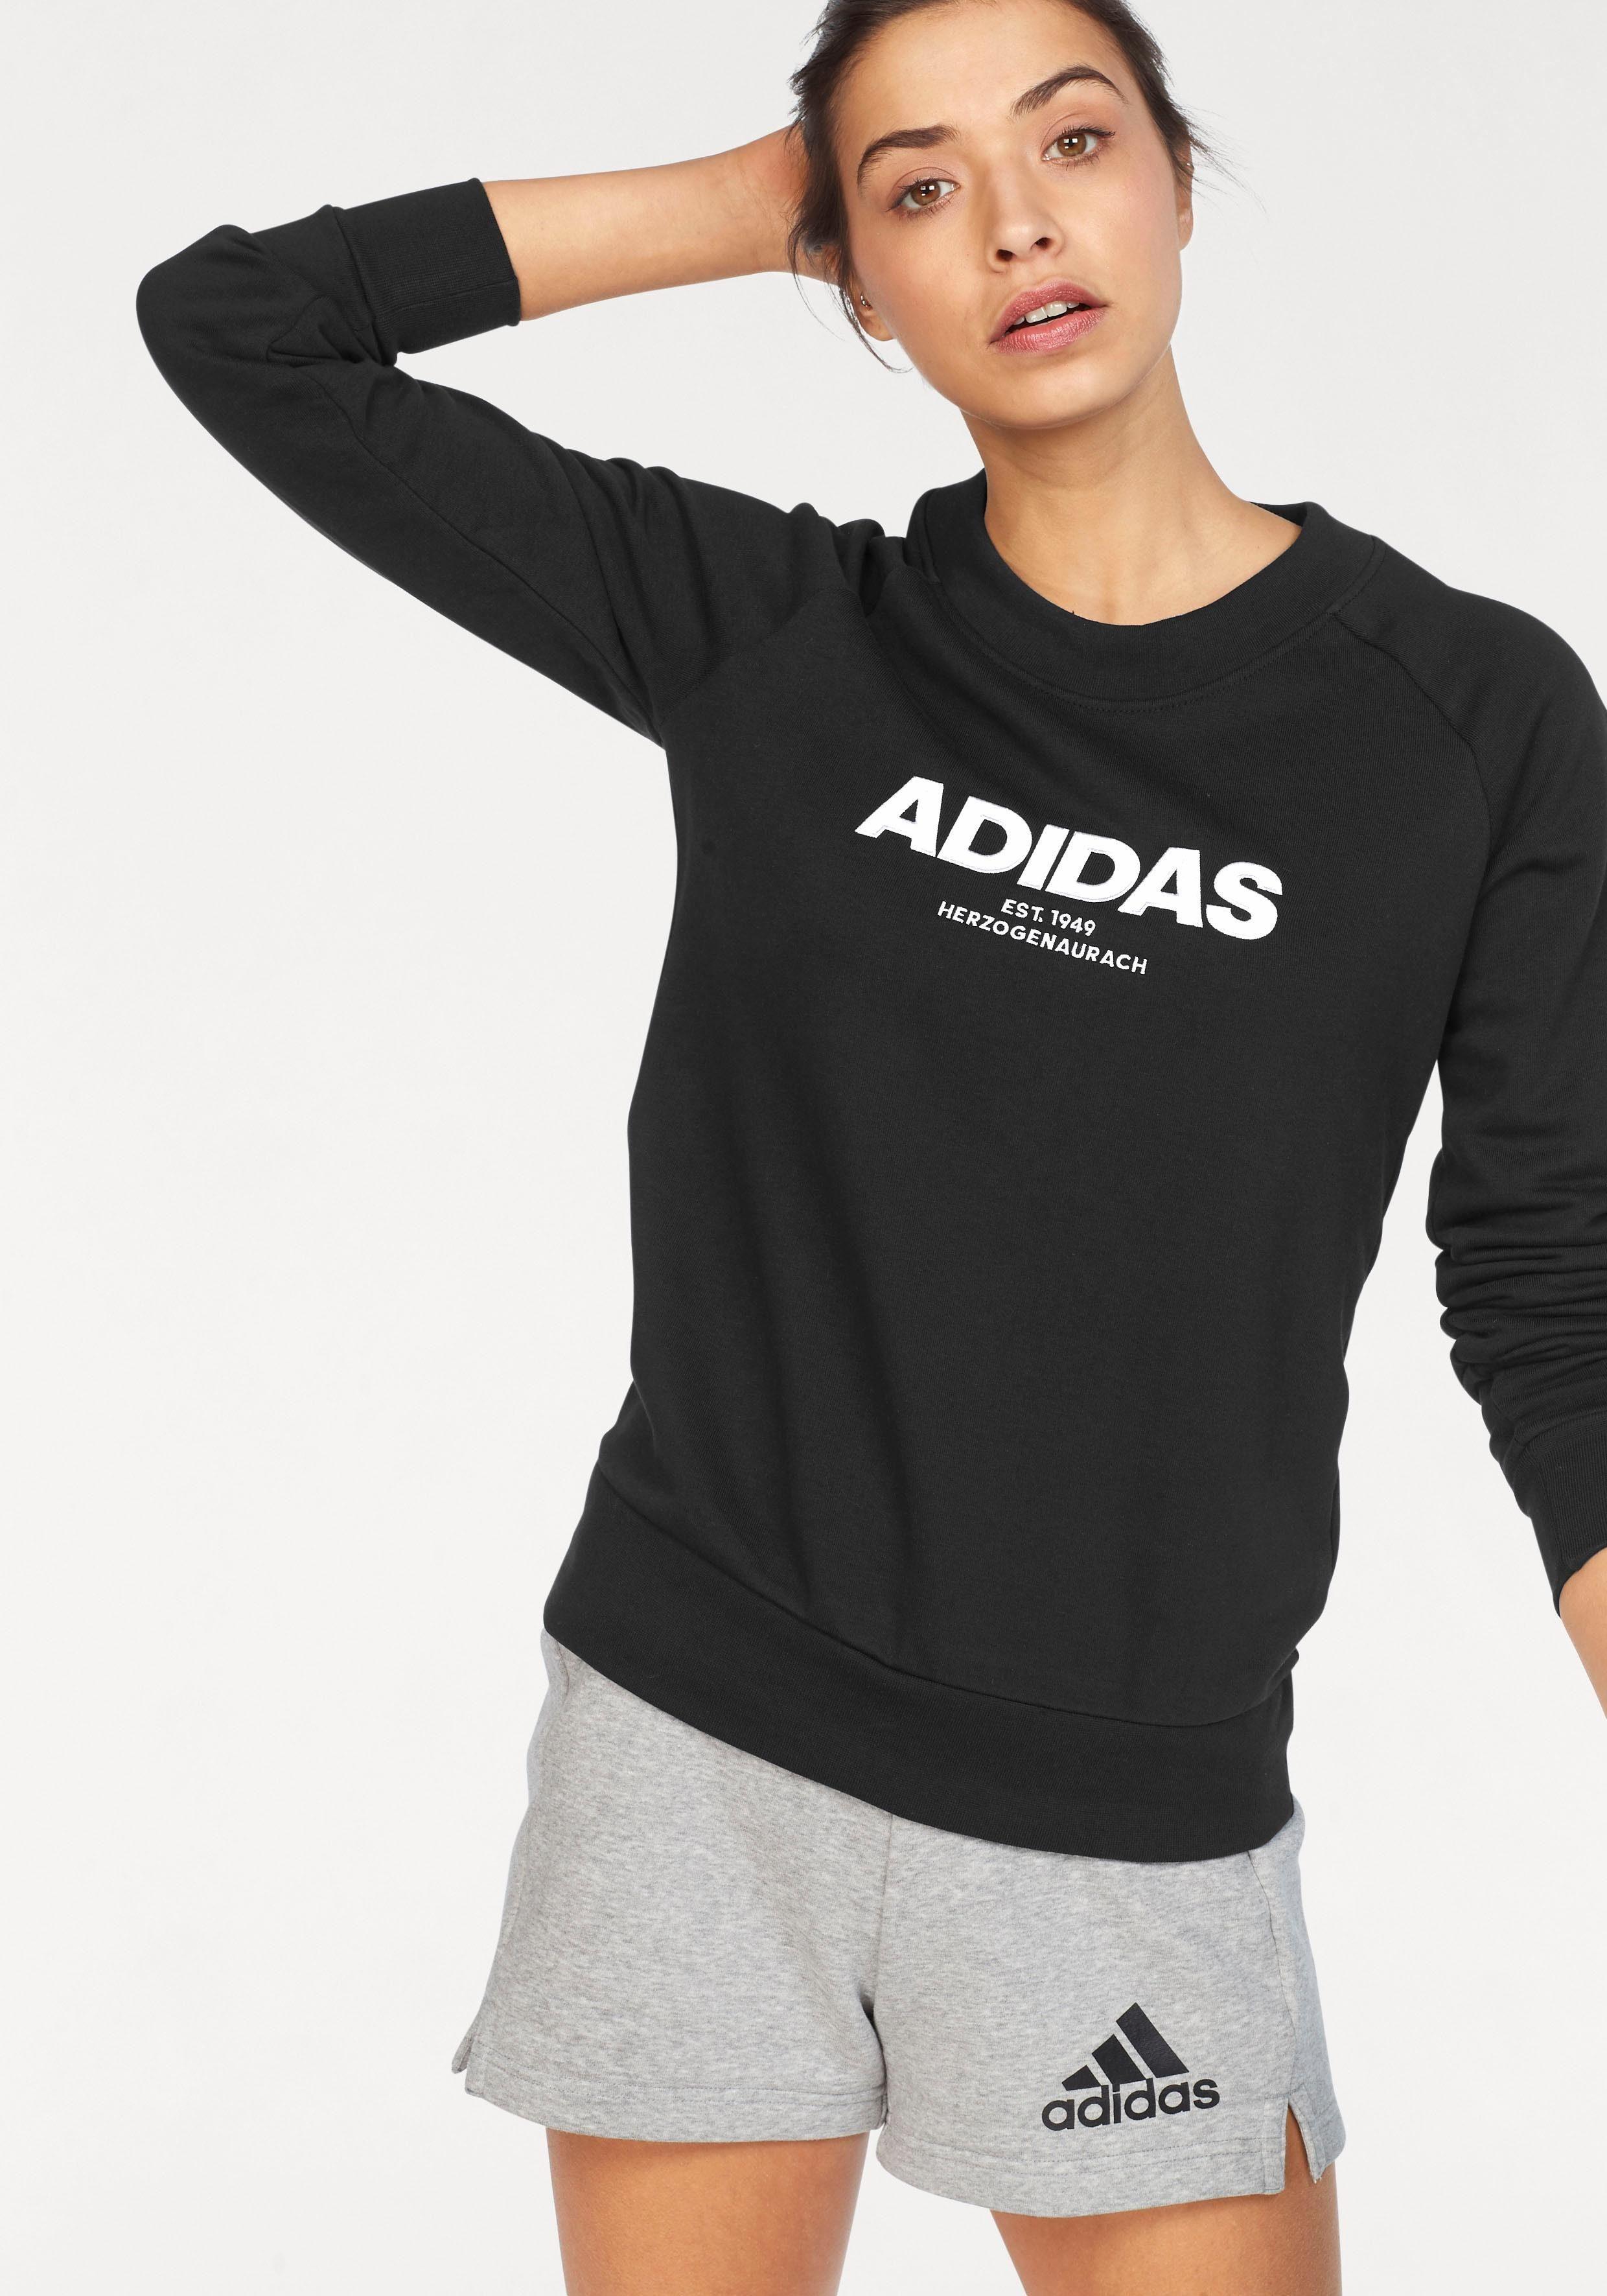 adidas Sweatshirt Label Print Raglanärmel für Damen Rosa